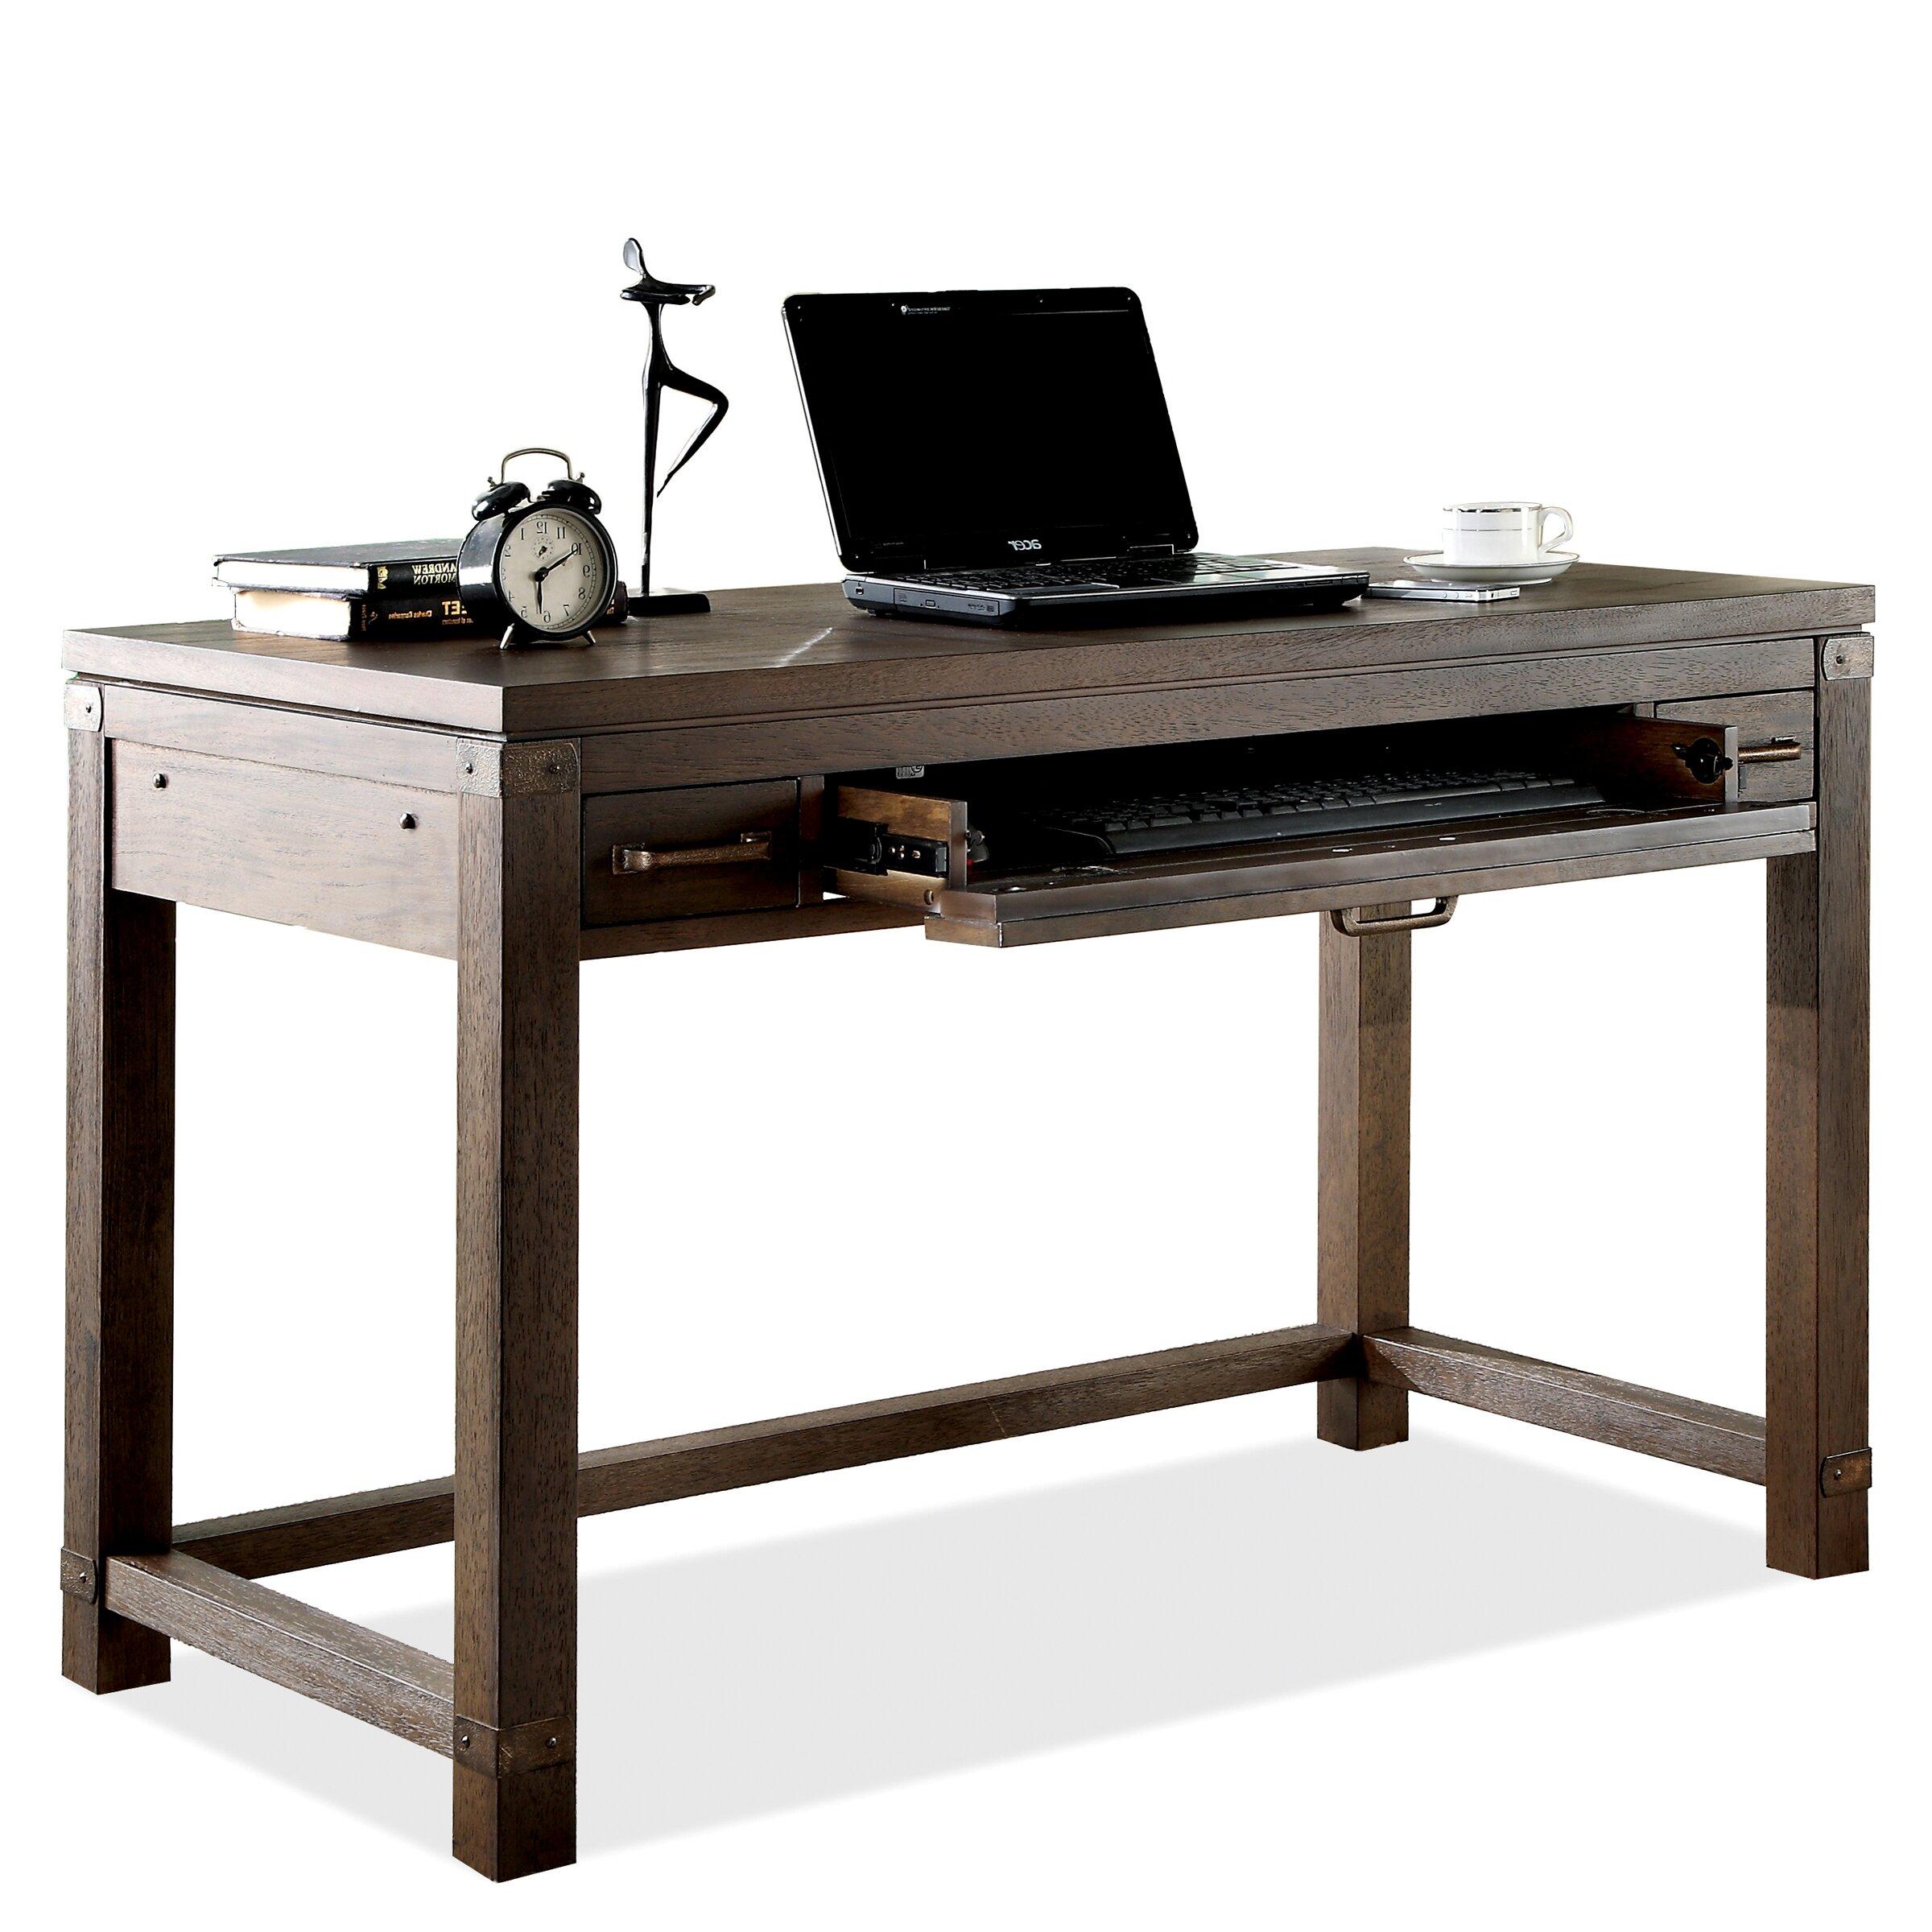 Thomasville Furniture Clearance